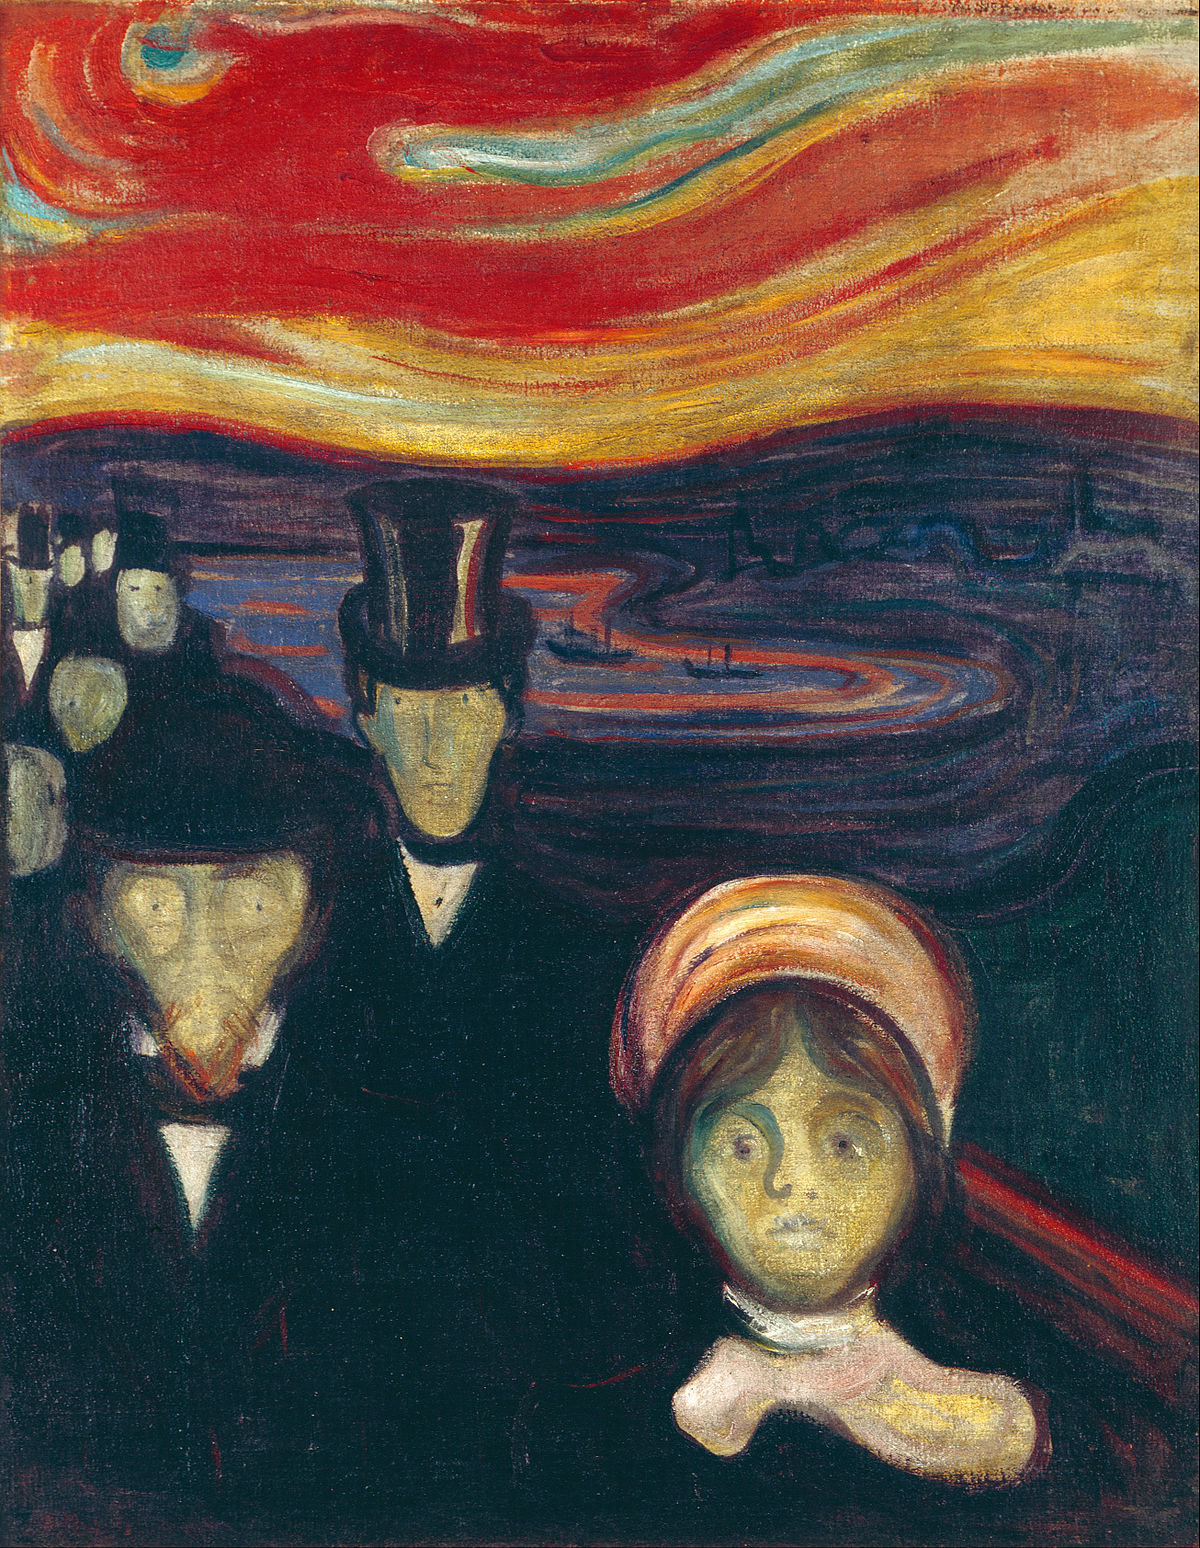 Edvard Munch. Ansiedade. 1894.